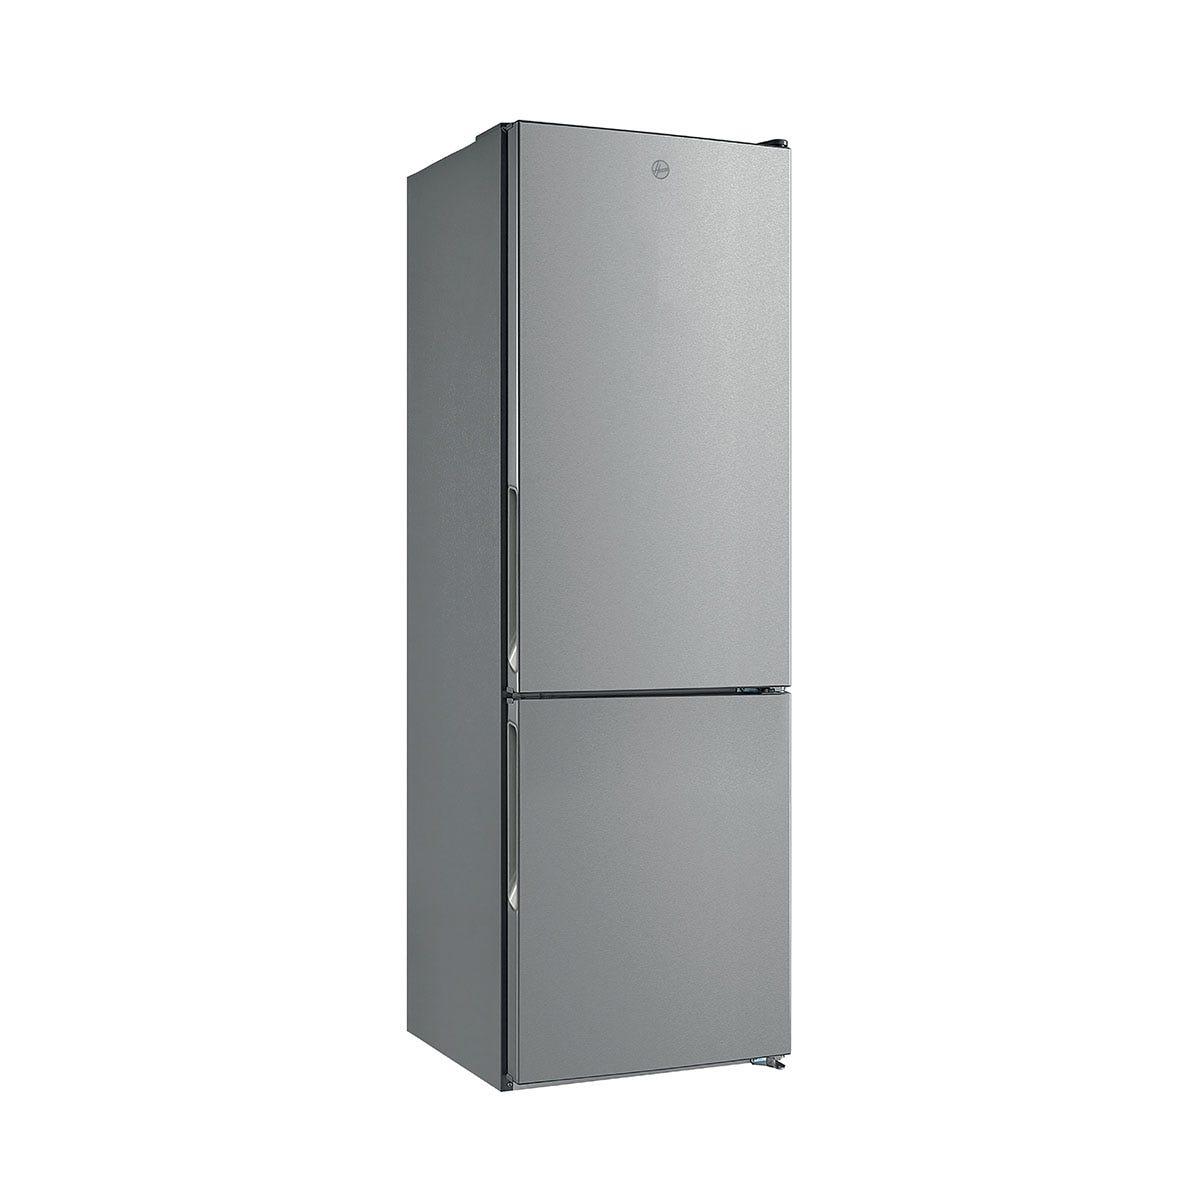 Hoover HMDNB 6184XK 60cm 302L Total No Frost Fridge Freezer - Stainless Steel